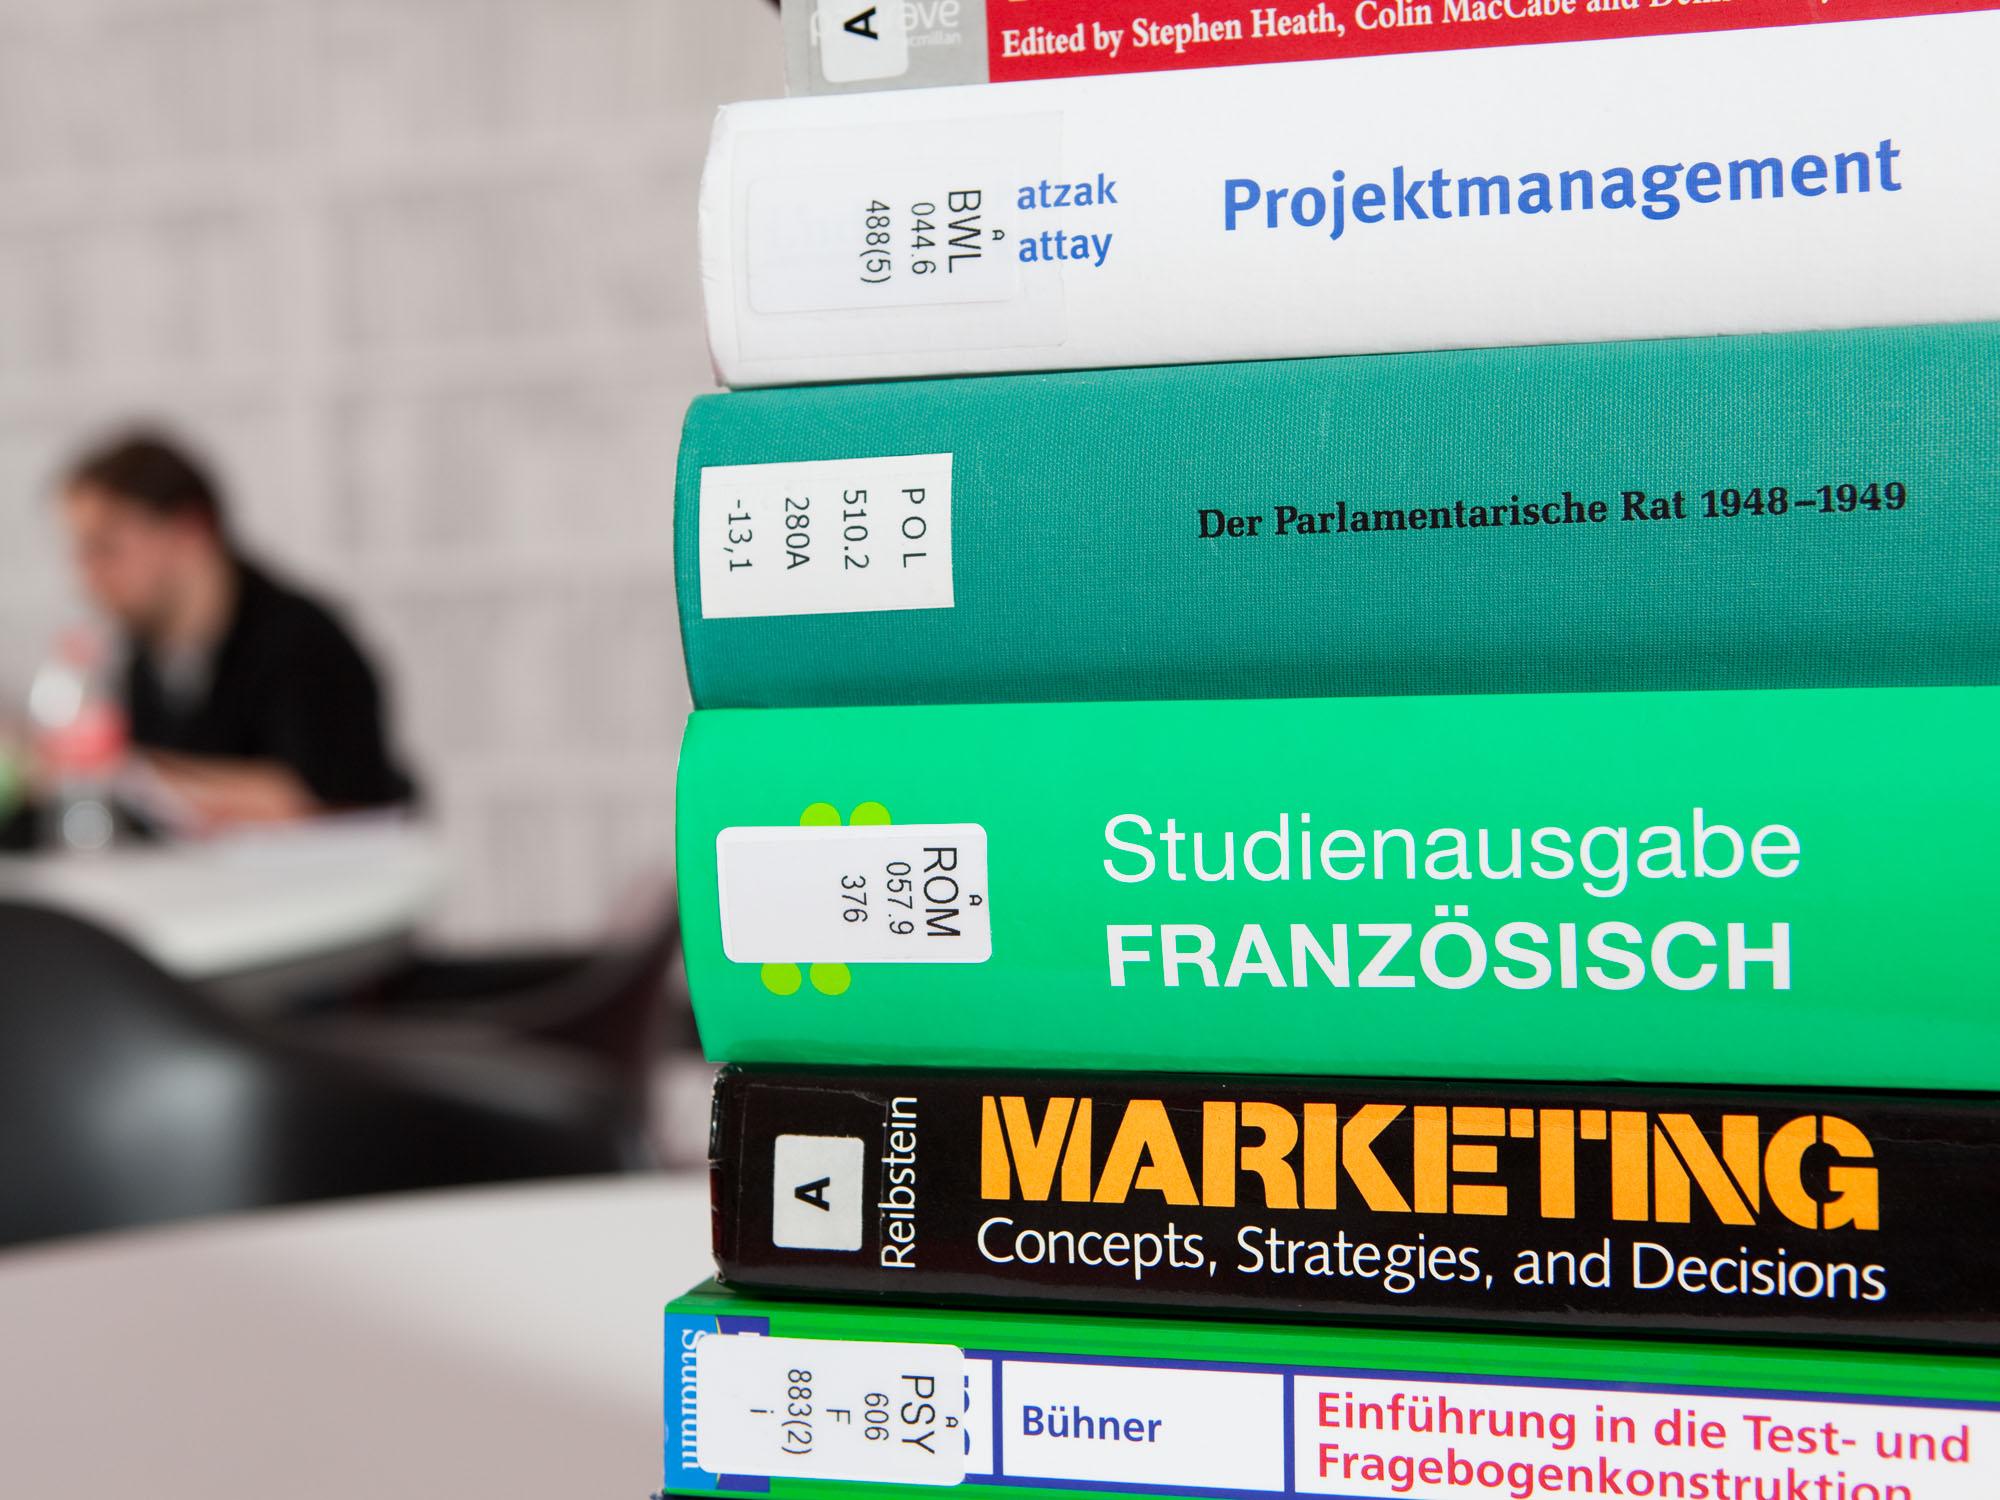 universitt bremen - Uni Bremen Online Bewerbung